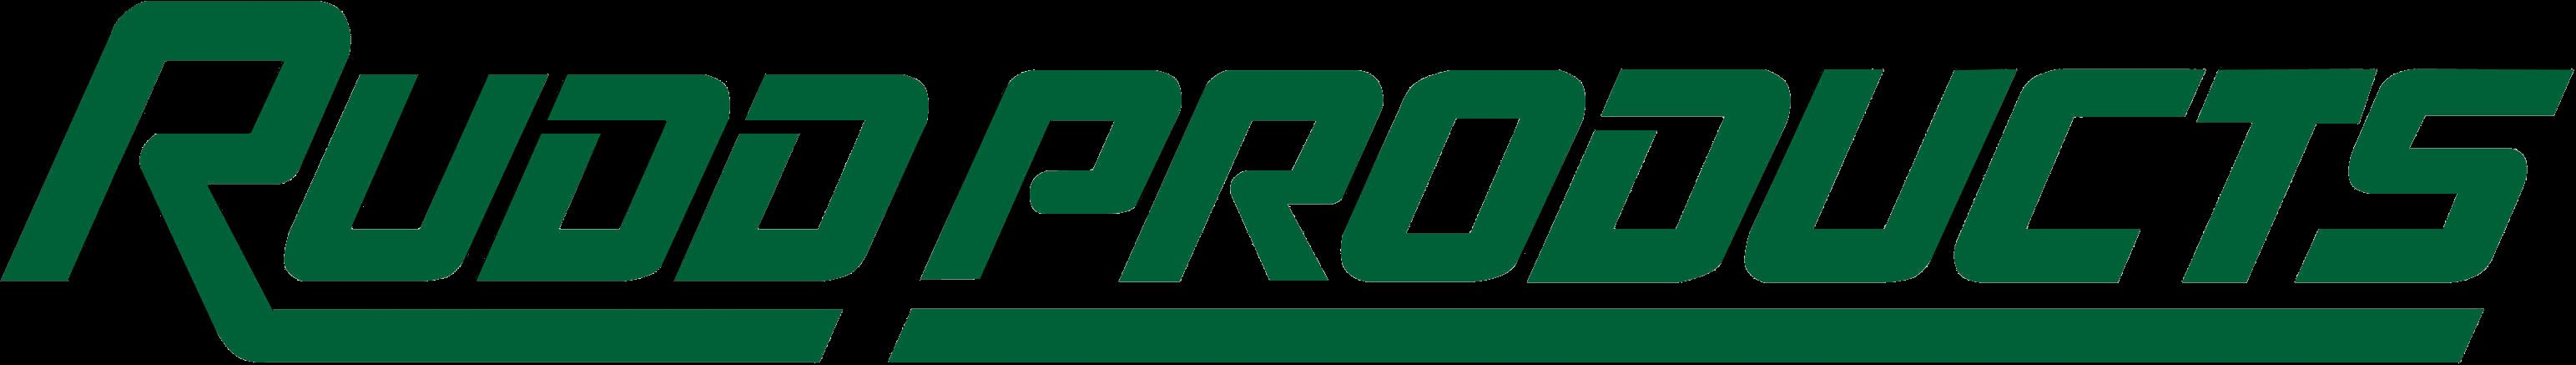 Rudd Products